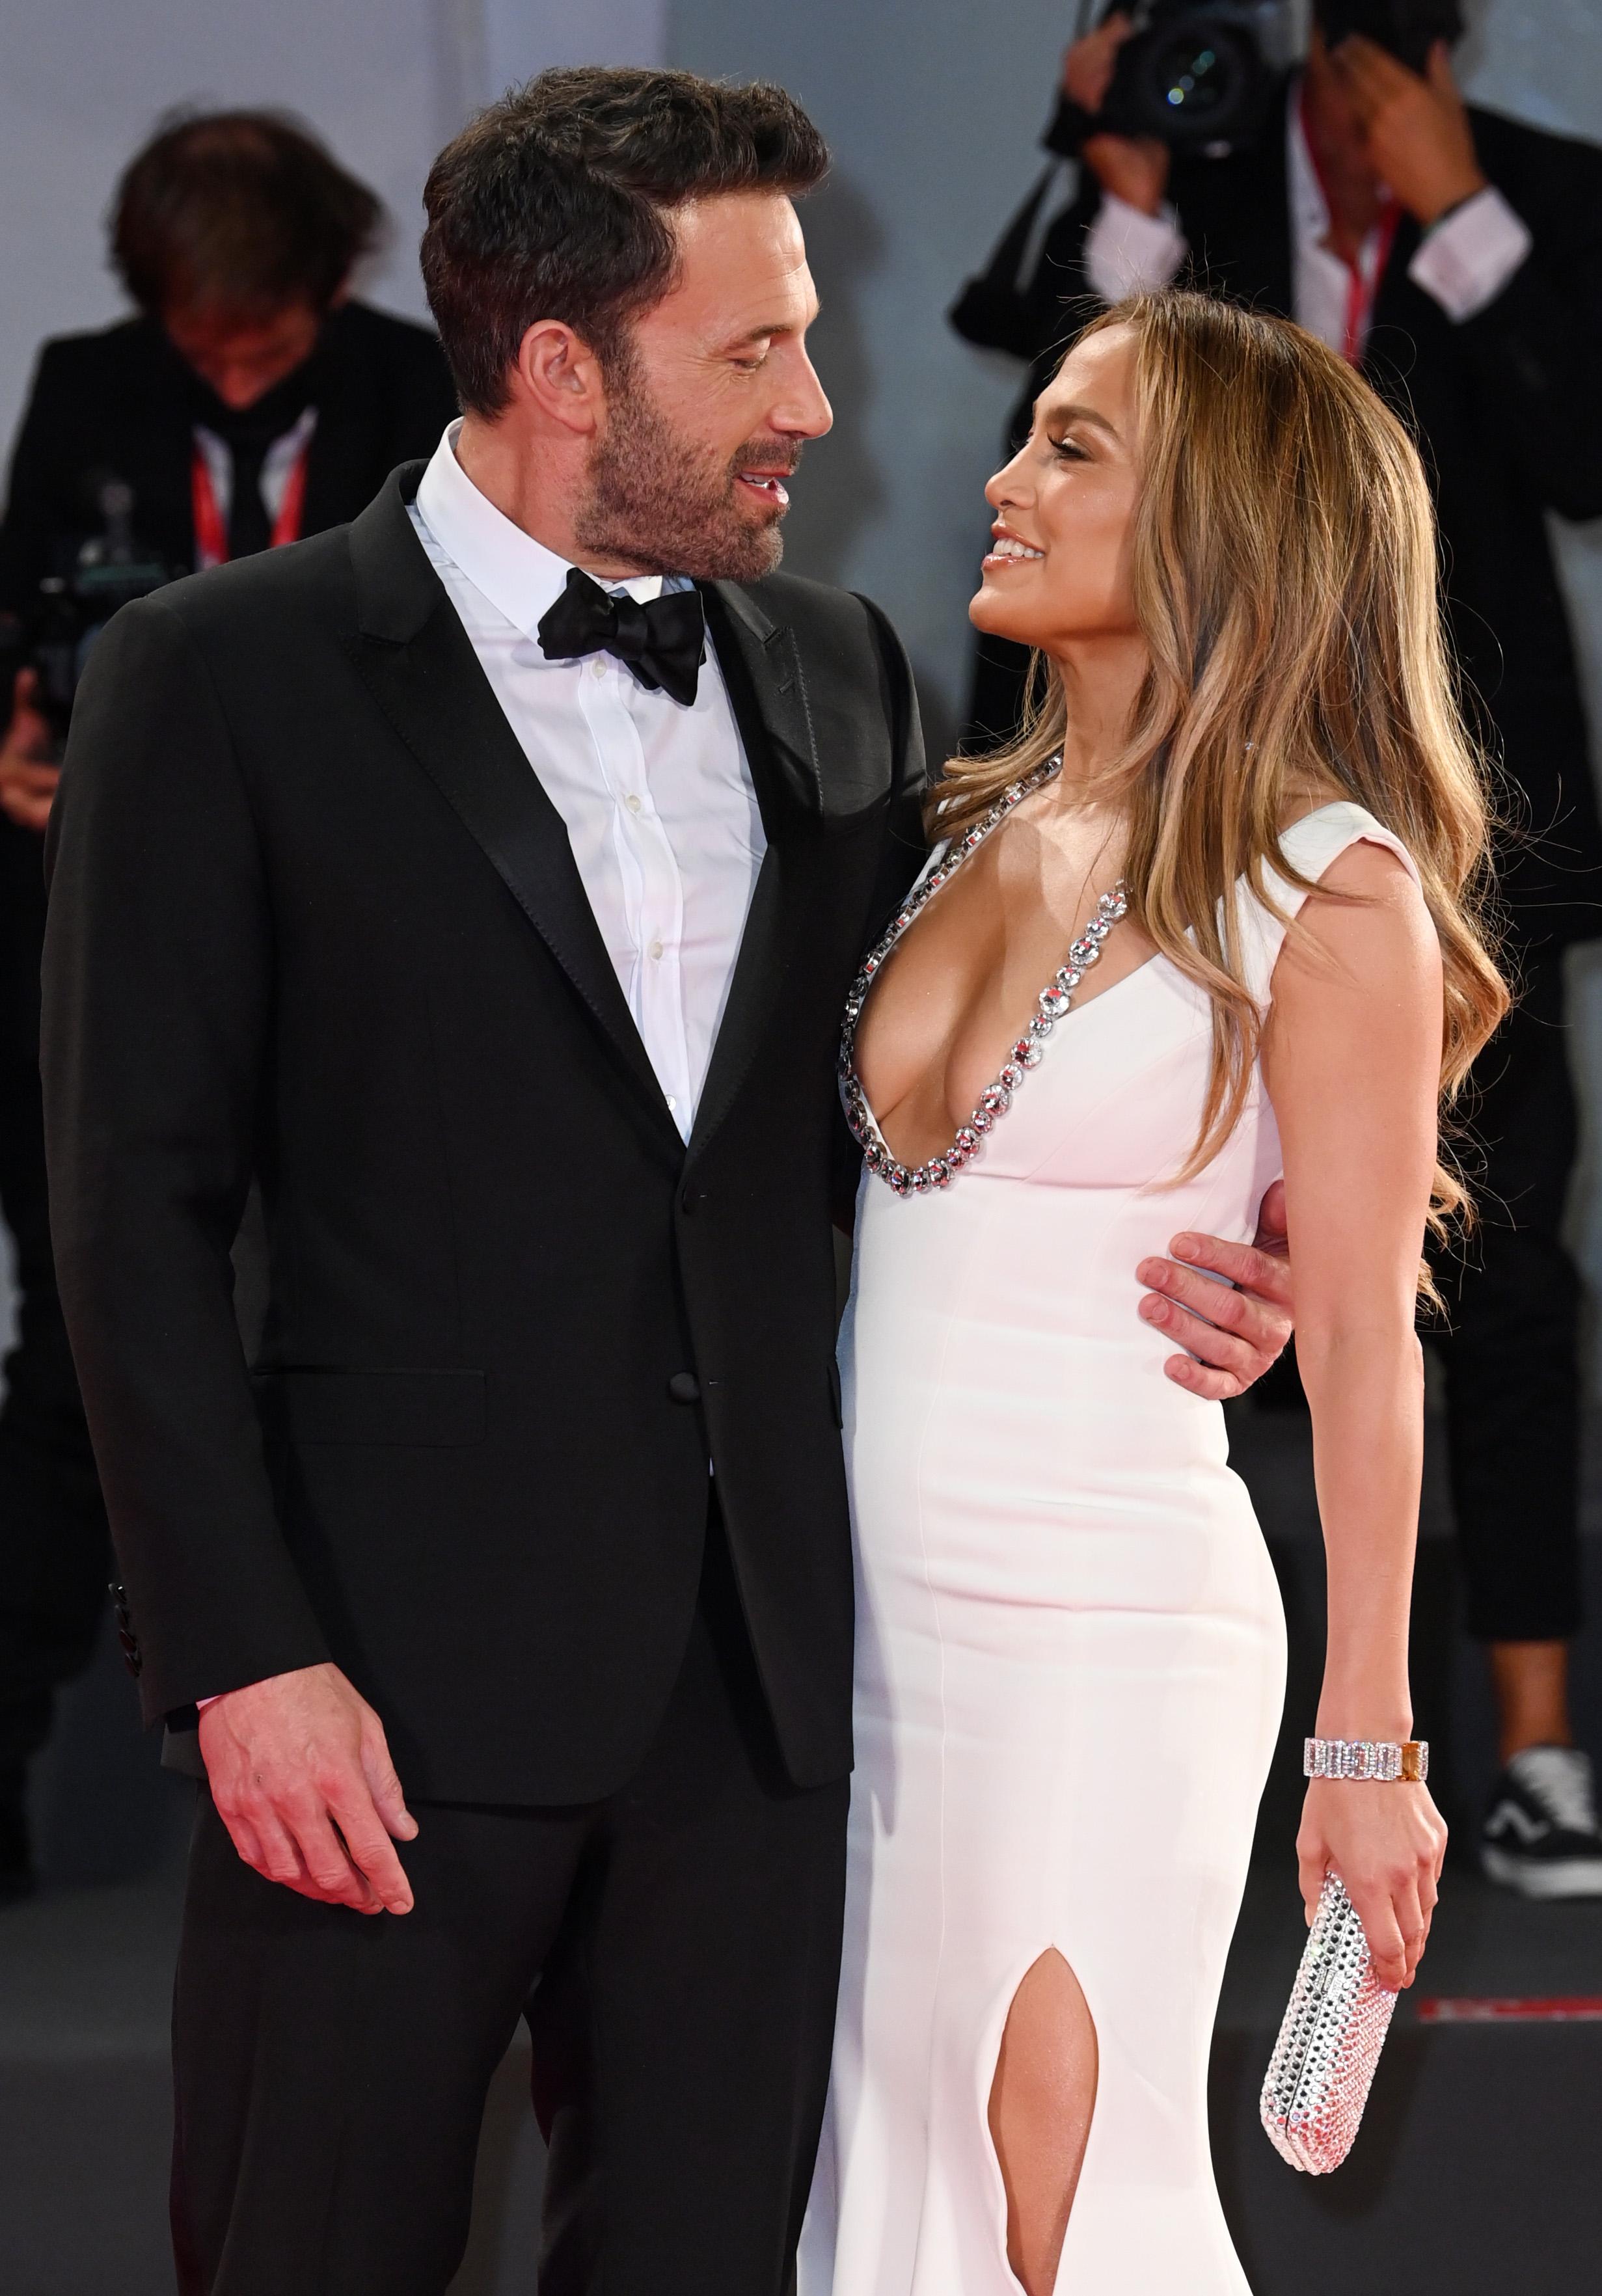 Ben Affleck In Awe Of Jennifer Lopez